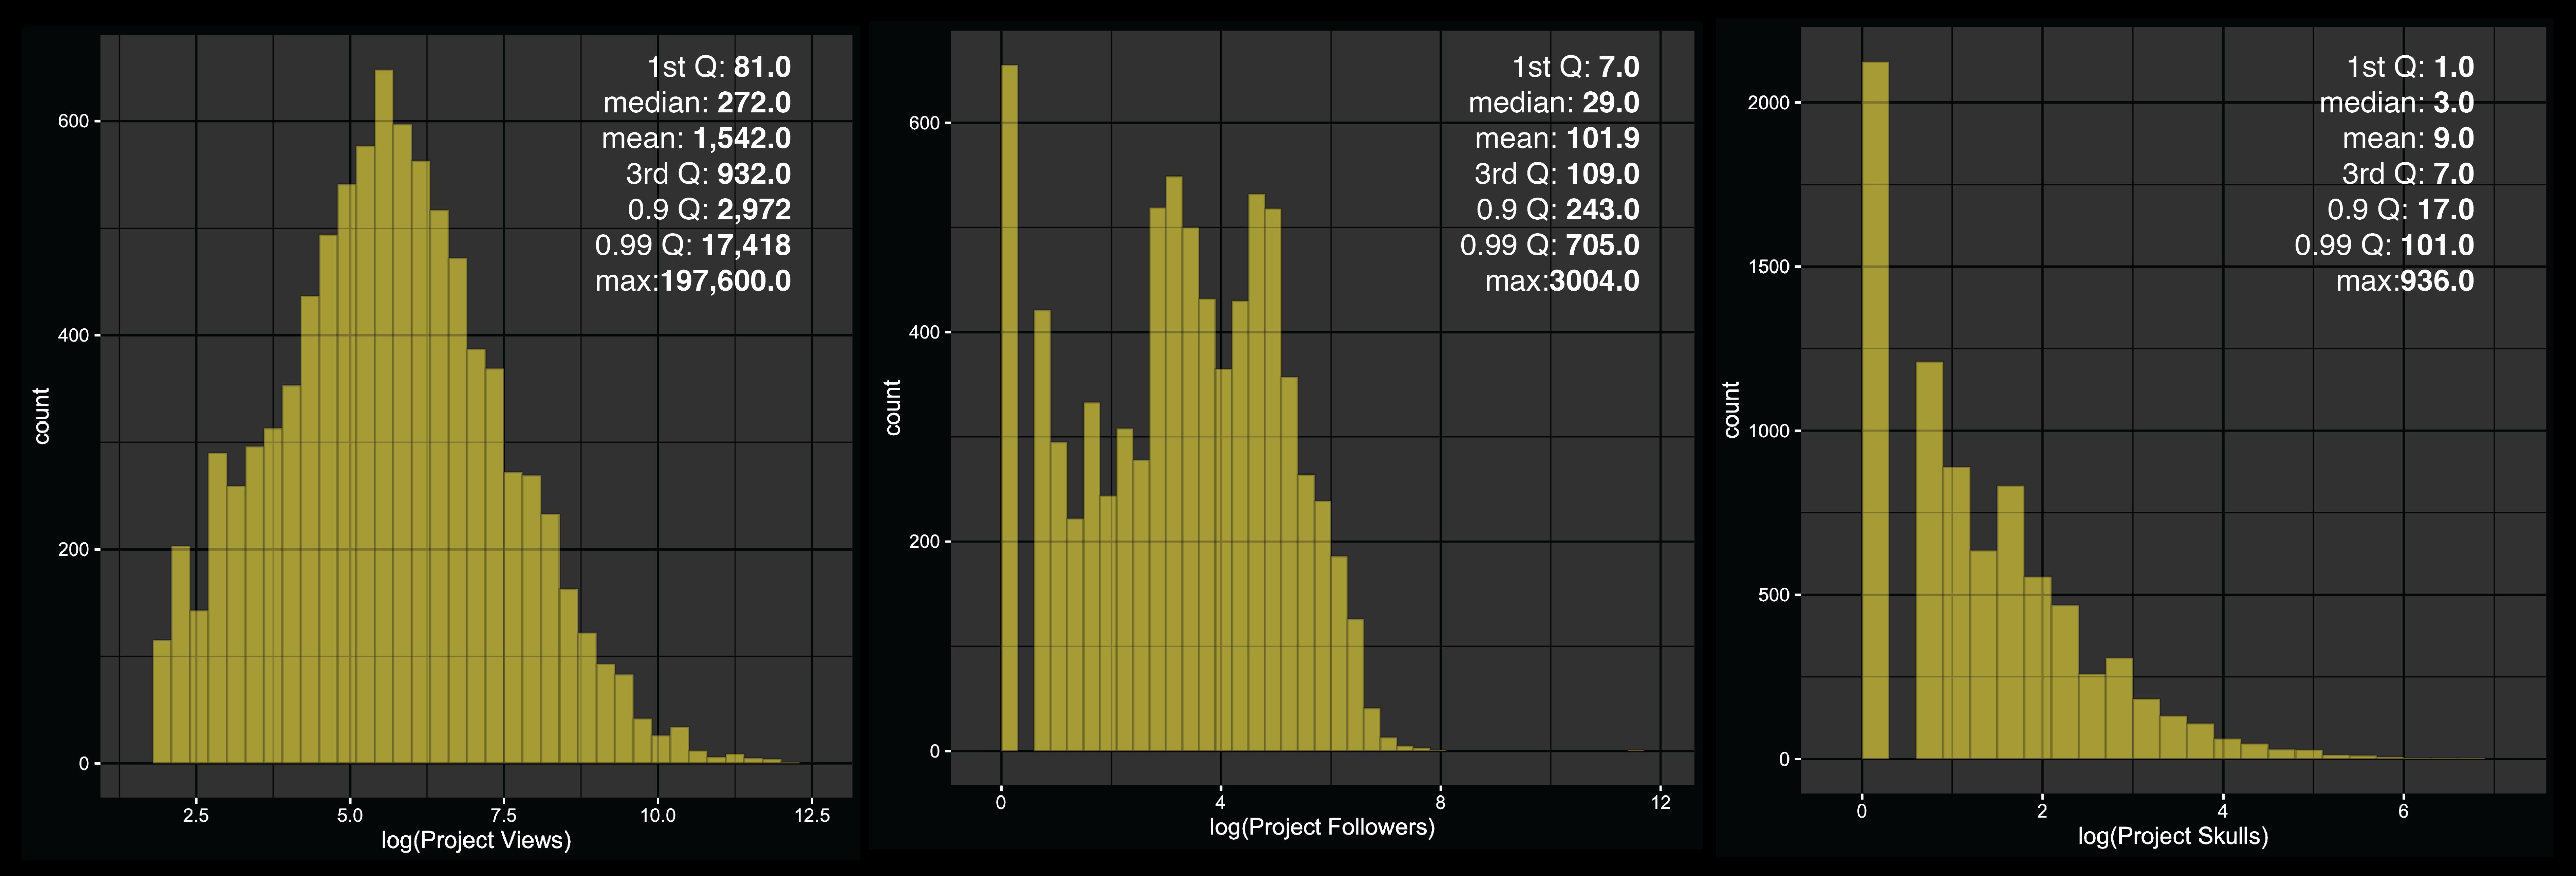 project_metrics